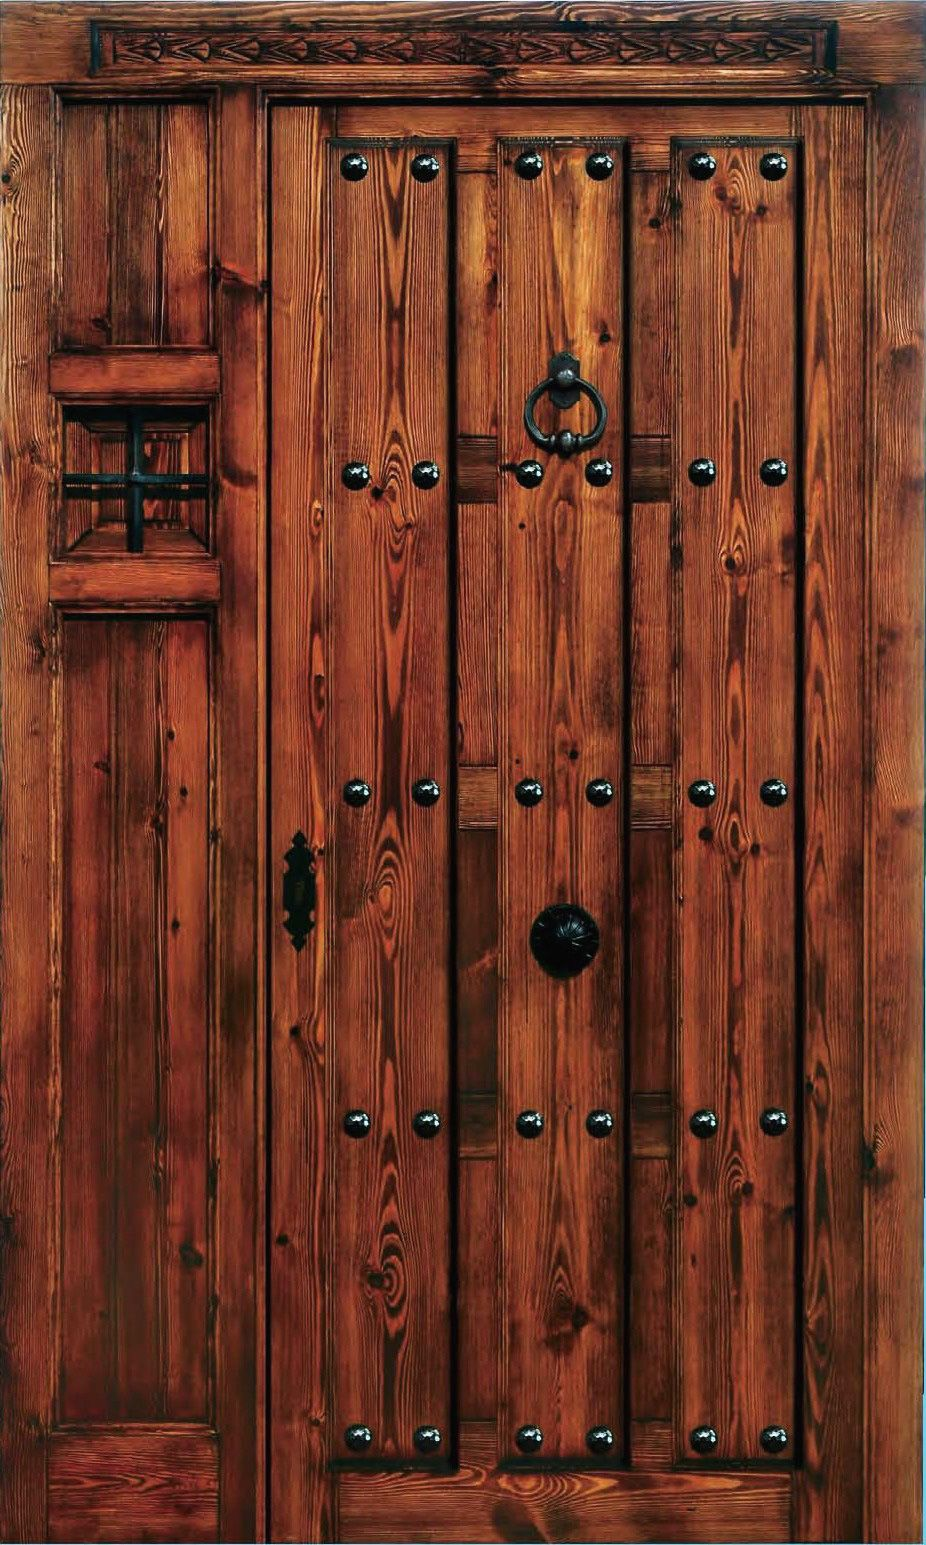 Pics photos puertas rusticas madera antiguas portones me interesa pinterest madera - Puertas madera antiguas ...